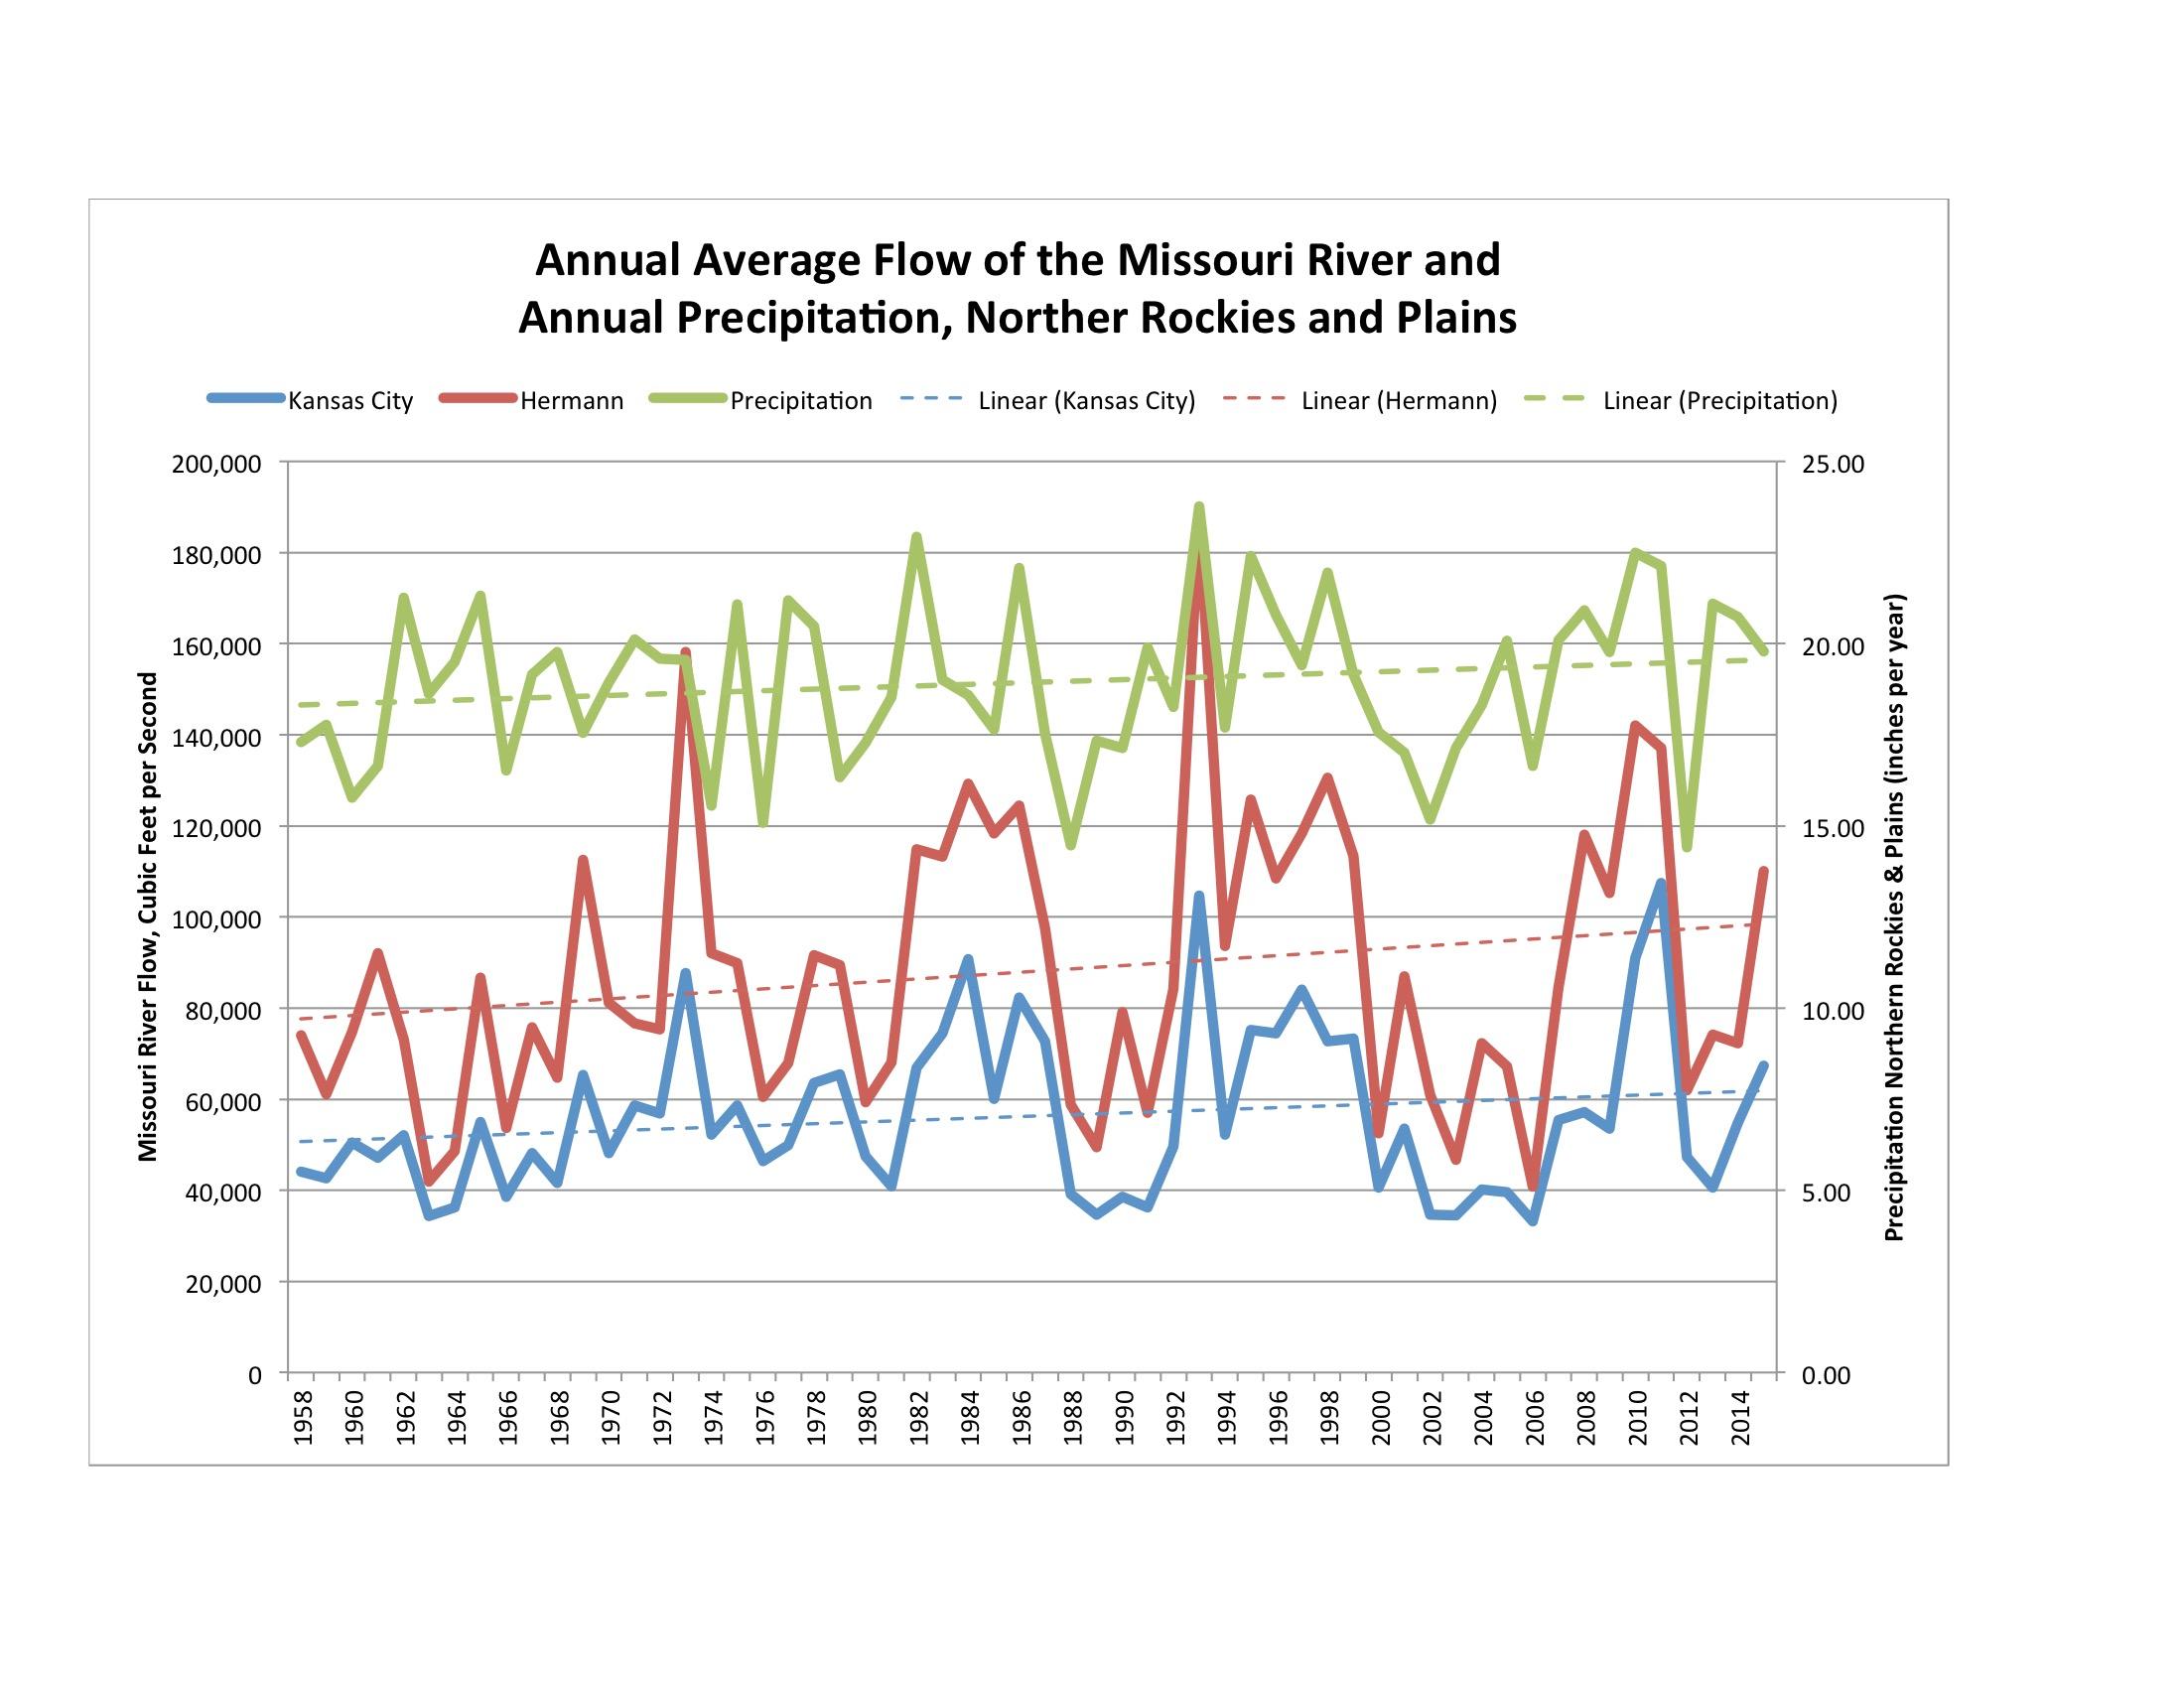 yearly variation in missouri river flow increasing mogreenstats rh mogreenstats com State of Missouri Obituaries Missouri Zip Codes List